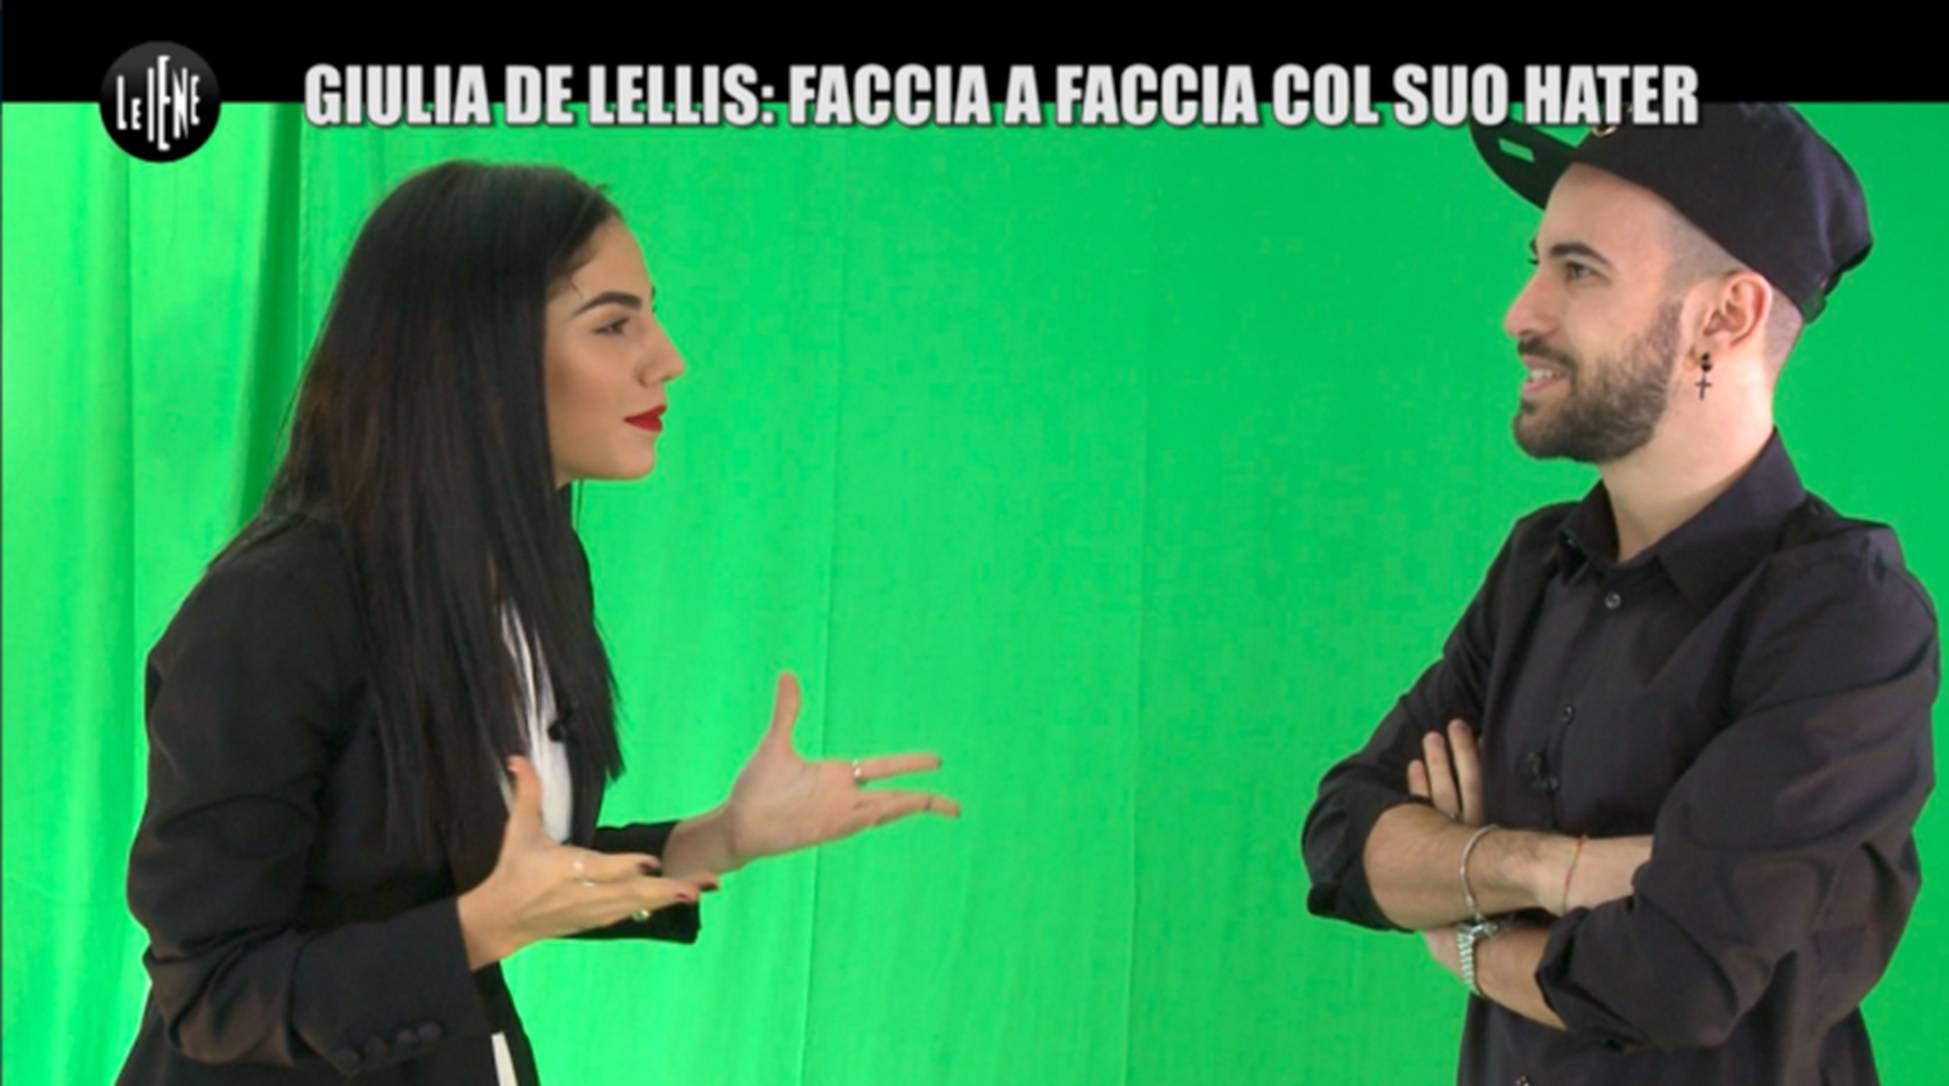 Giulia De Lellis, hater